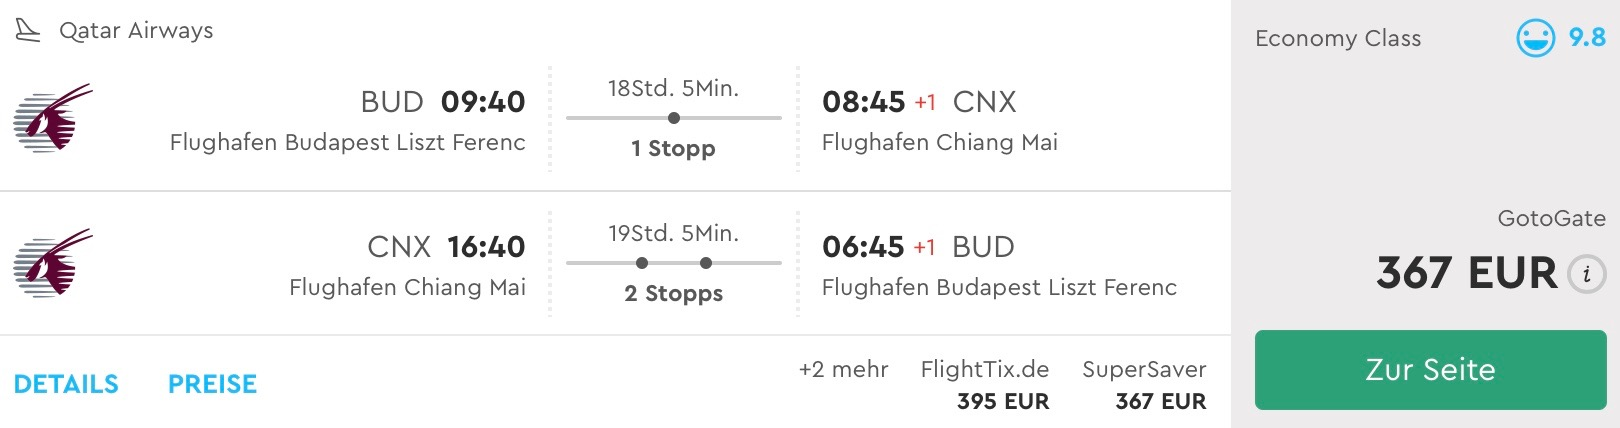 Thajsko s 5* Qatar Airways: Budapešť – Chiang Mai už od 367€